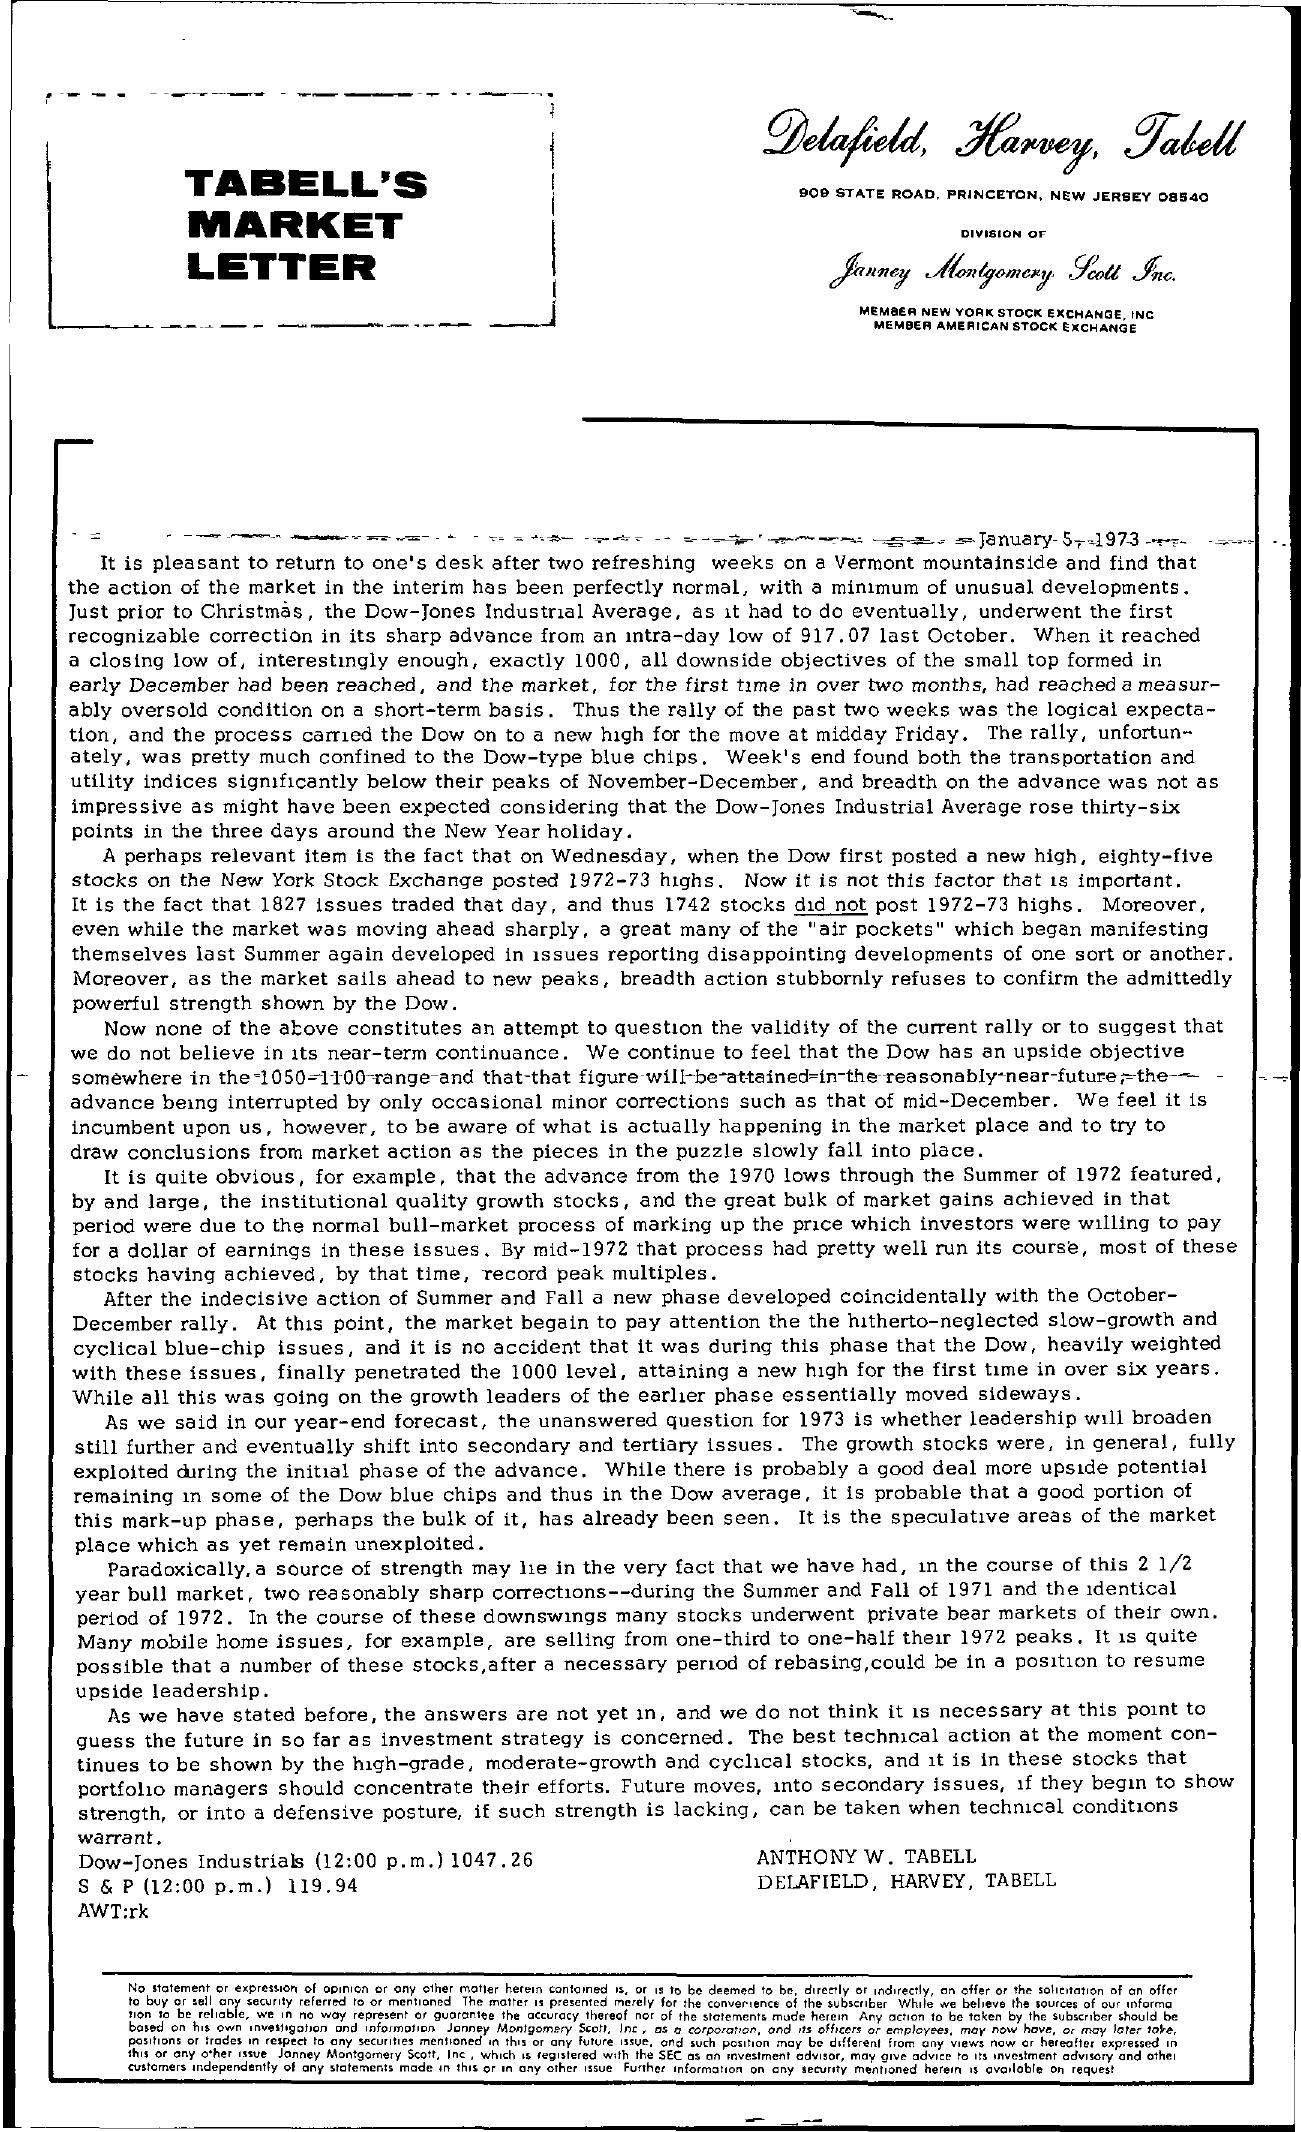 Tabell's Market Letter - January 05, 1973